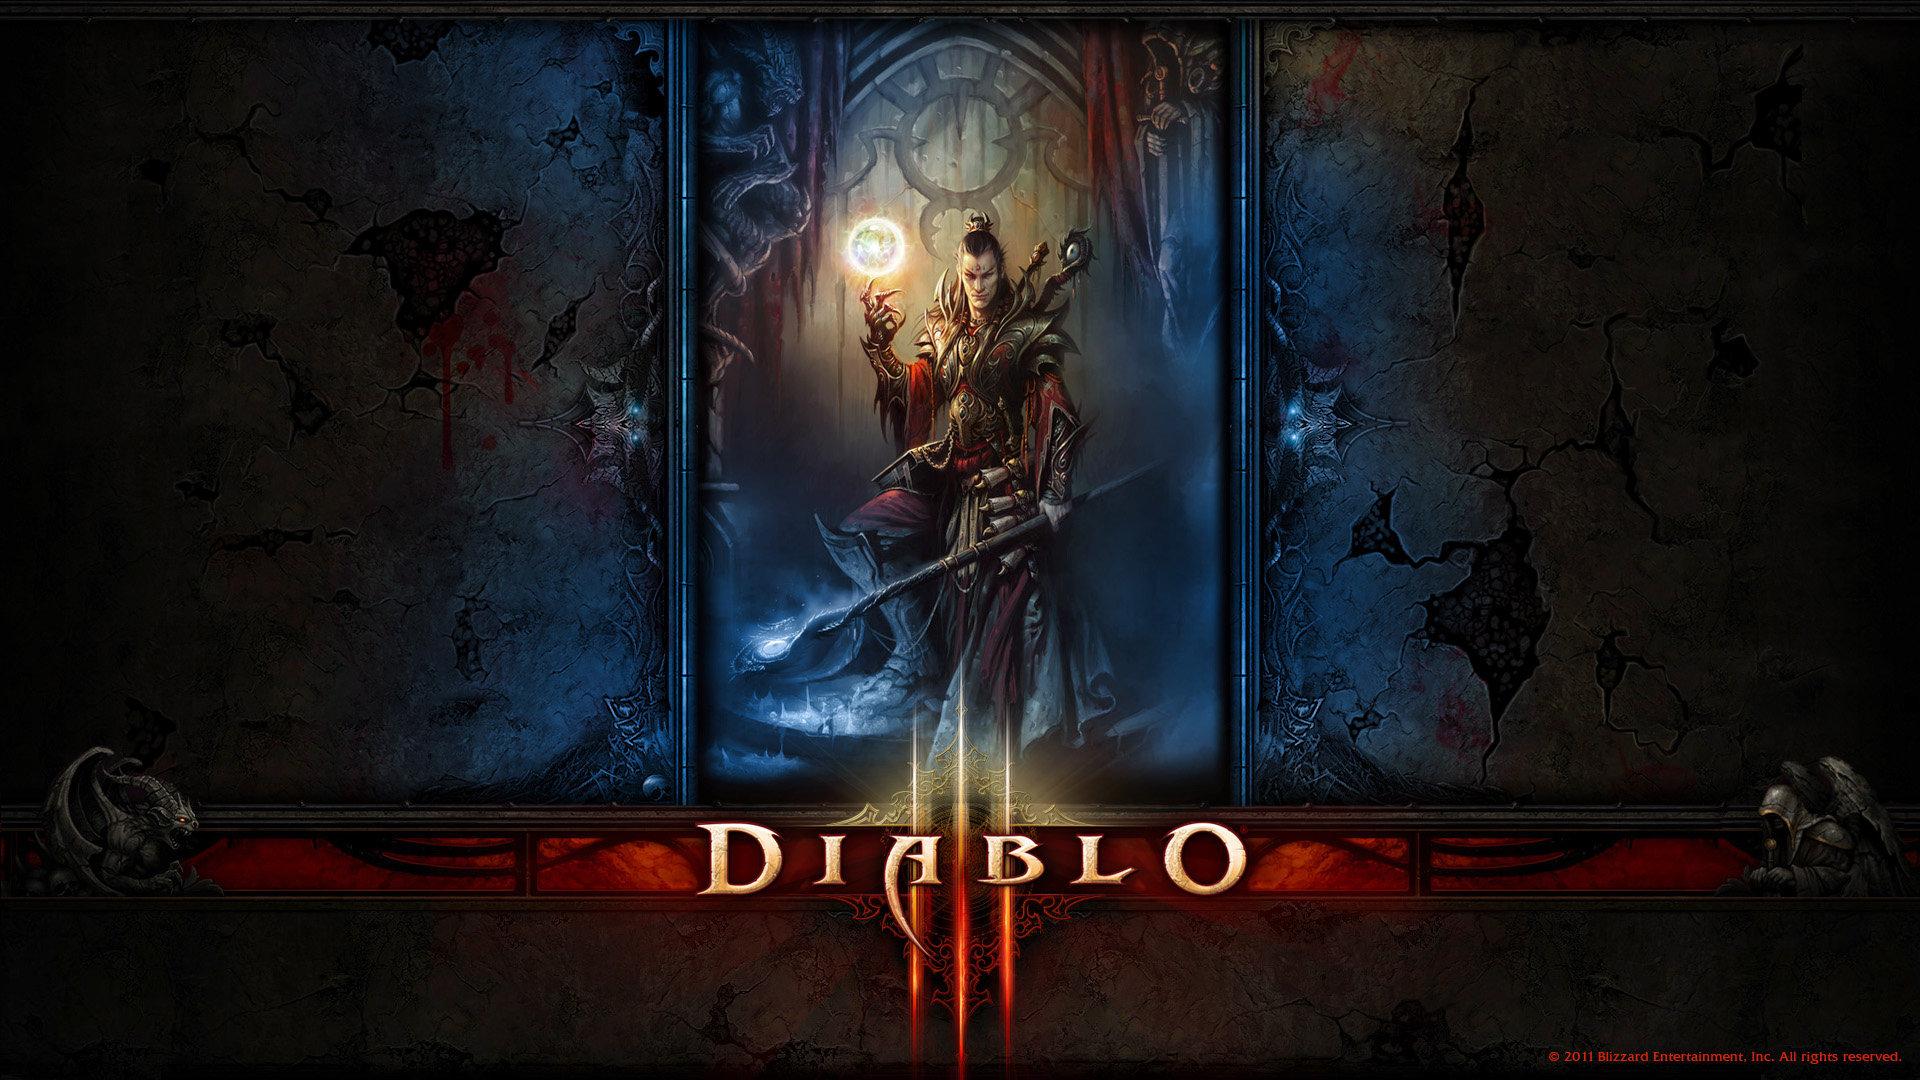 Wizard Diablo 3 Wallpapers 1920x1080 Full Hd 1080p Desktop